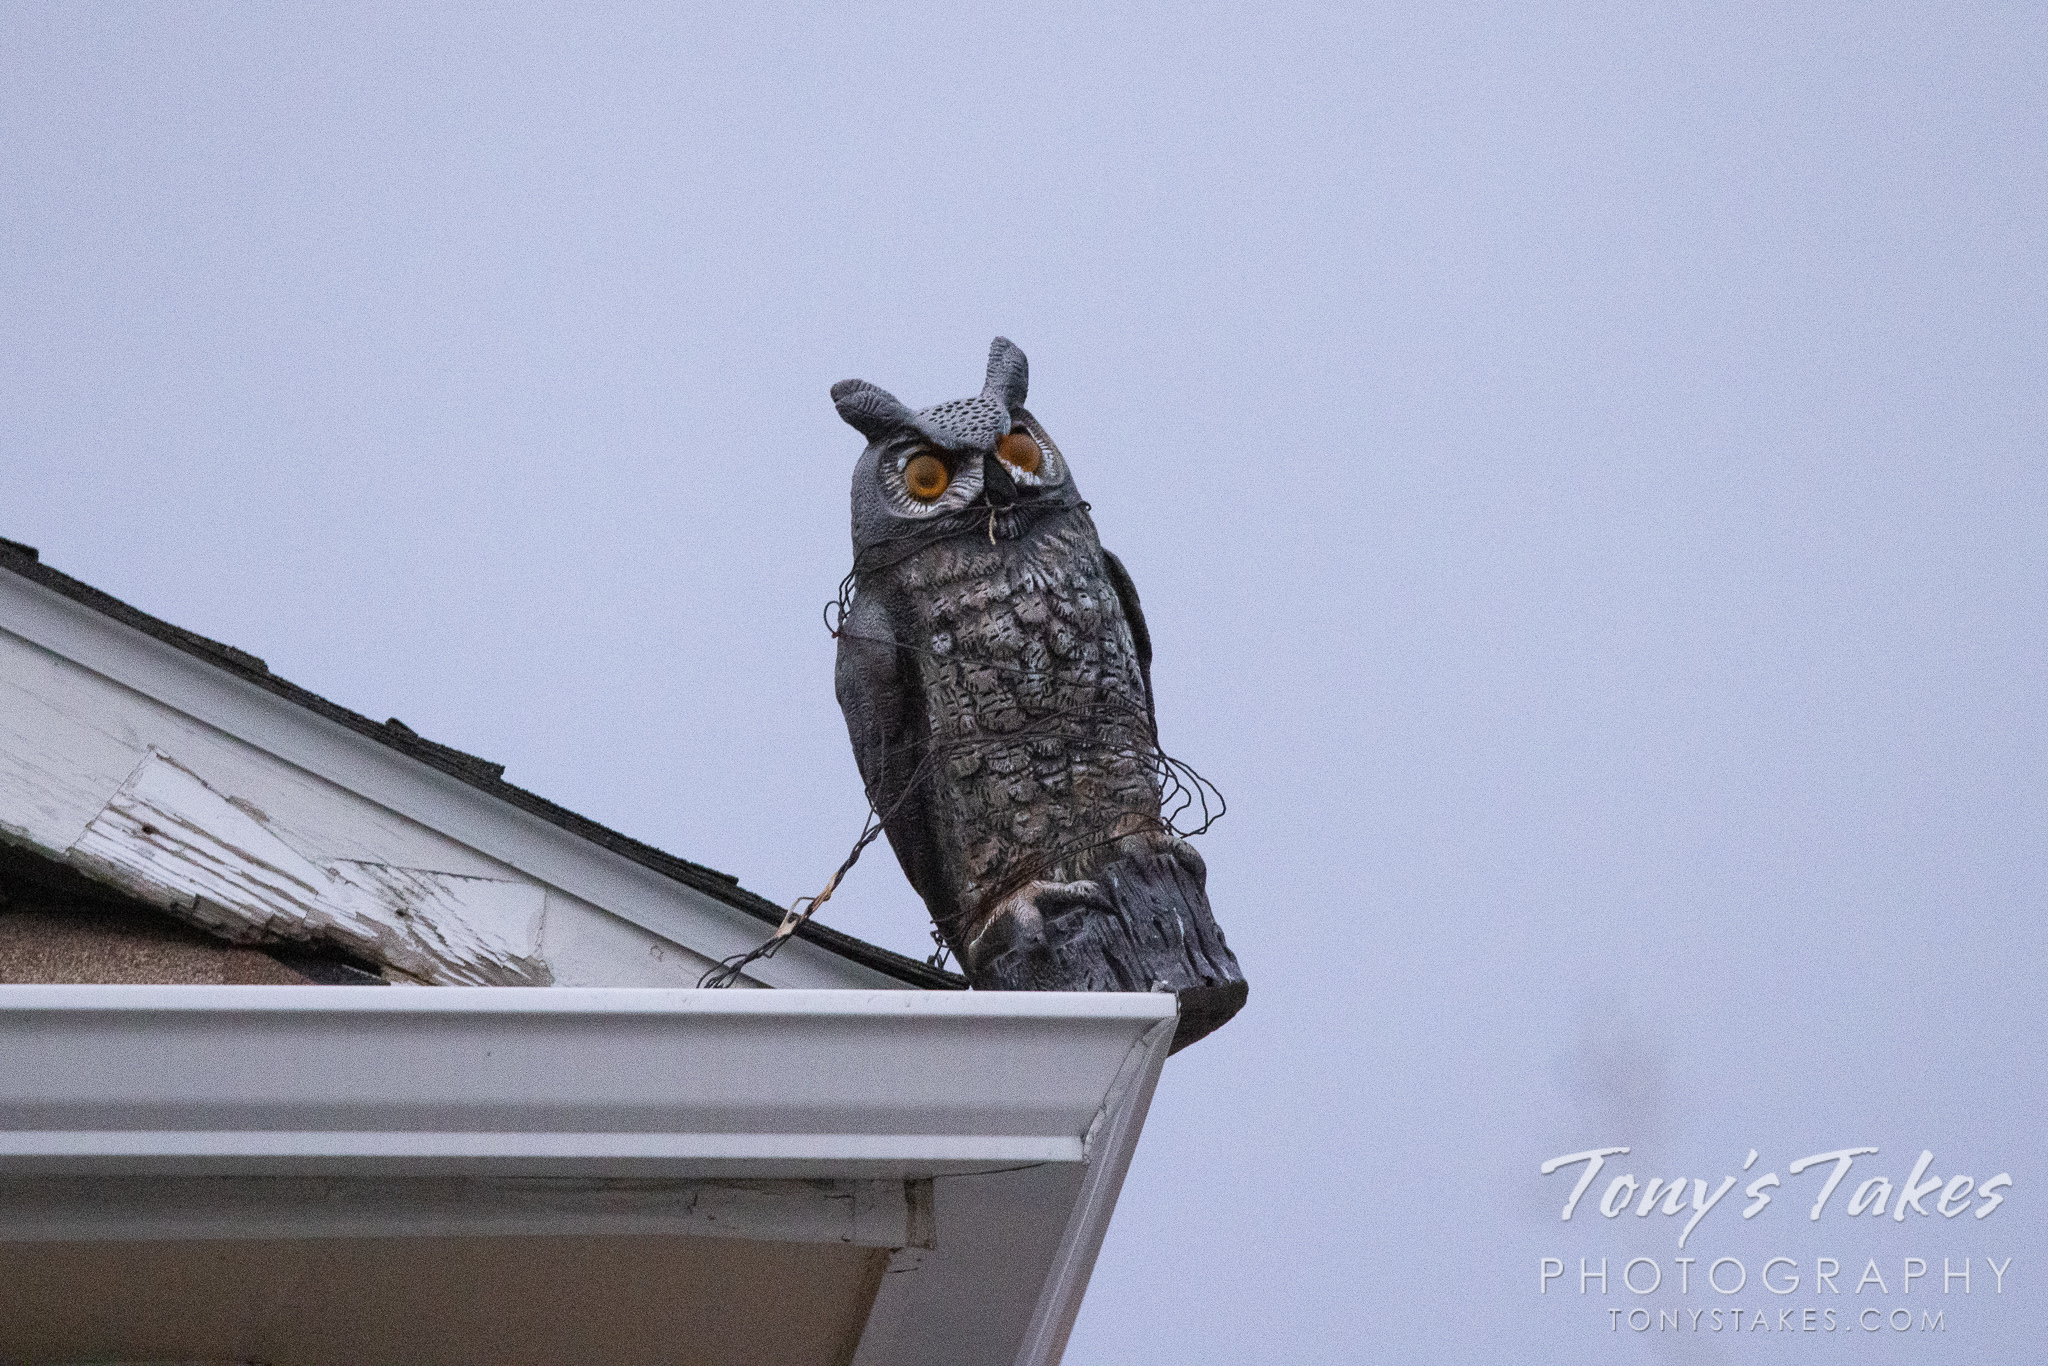 Neighborhood owl finally spotted!